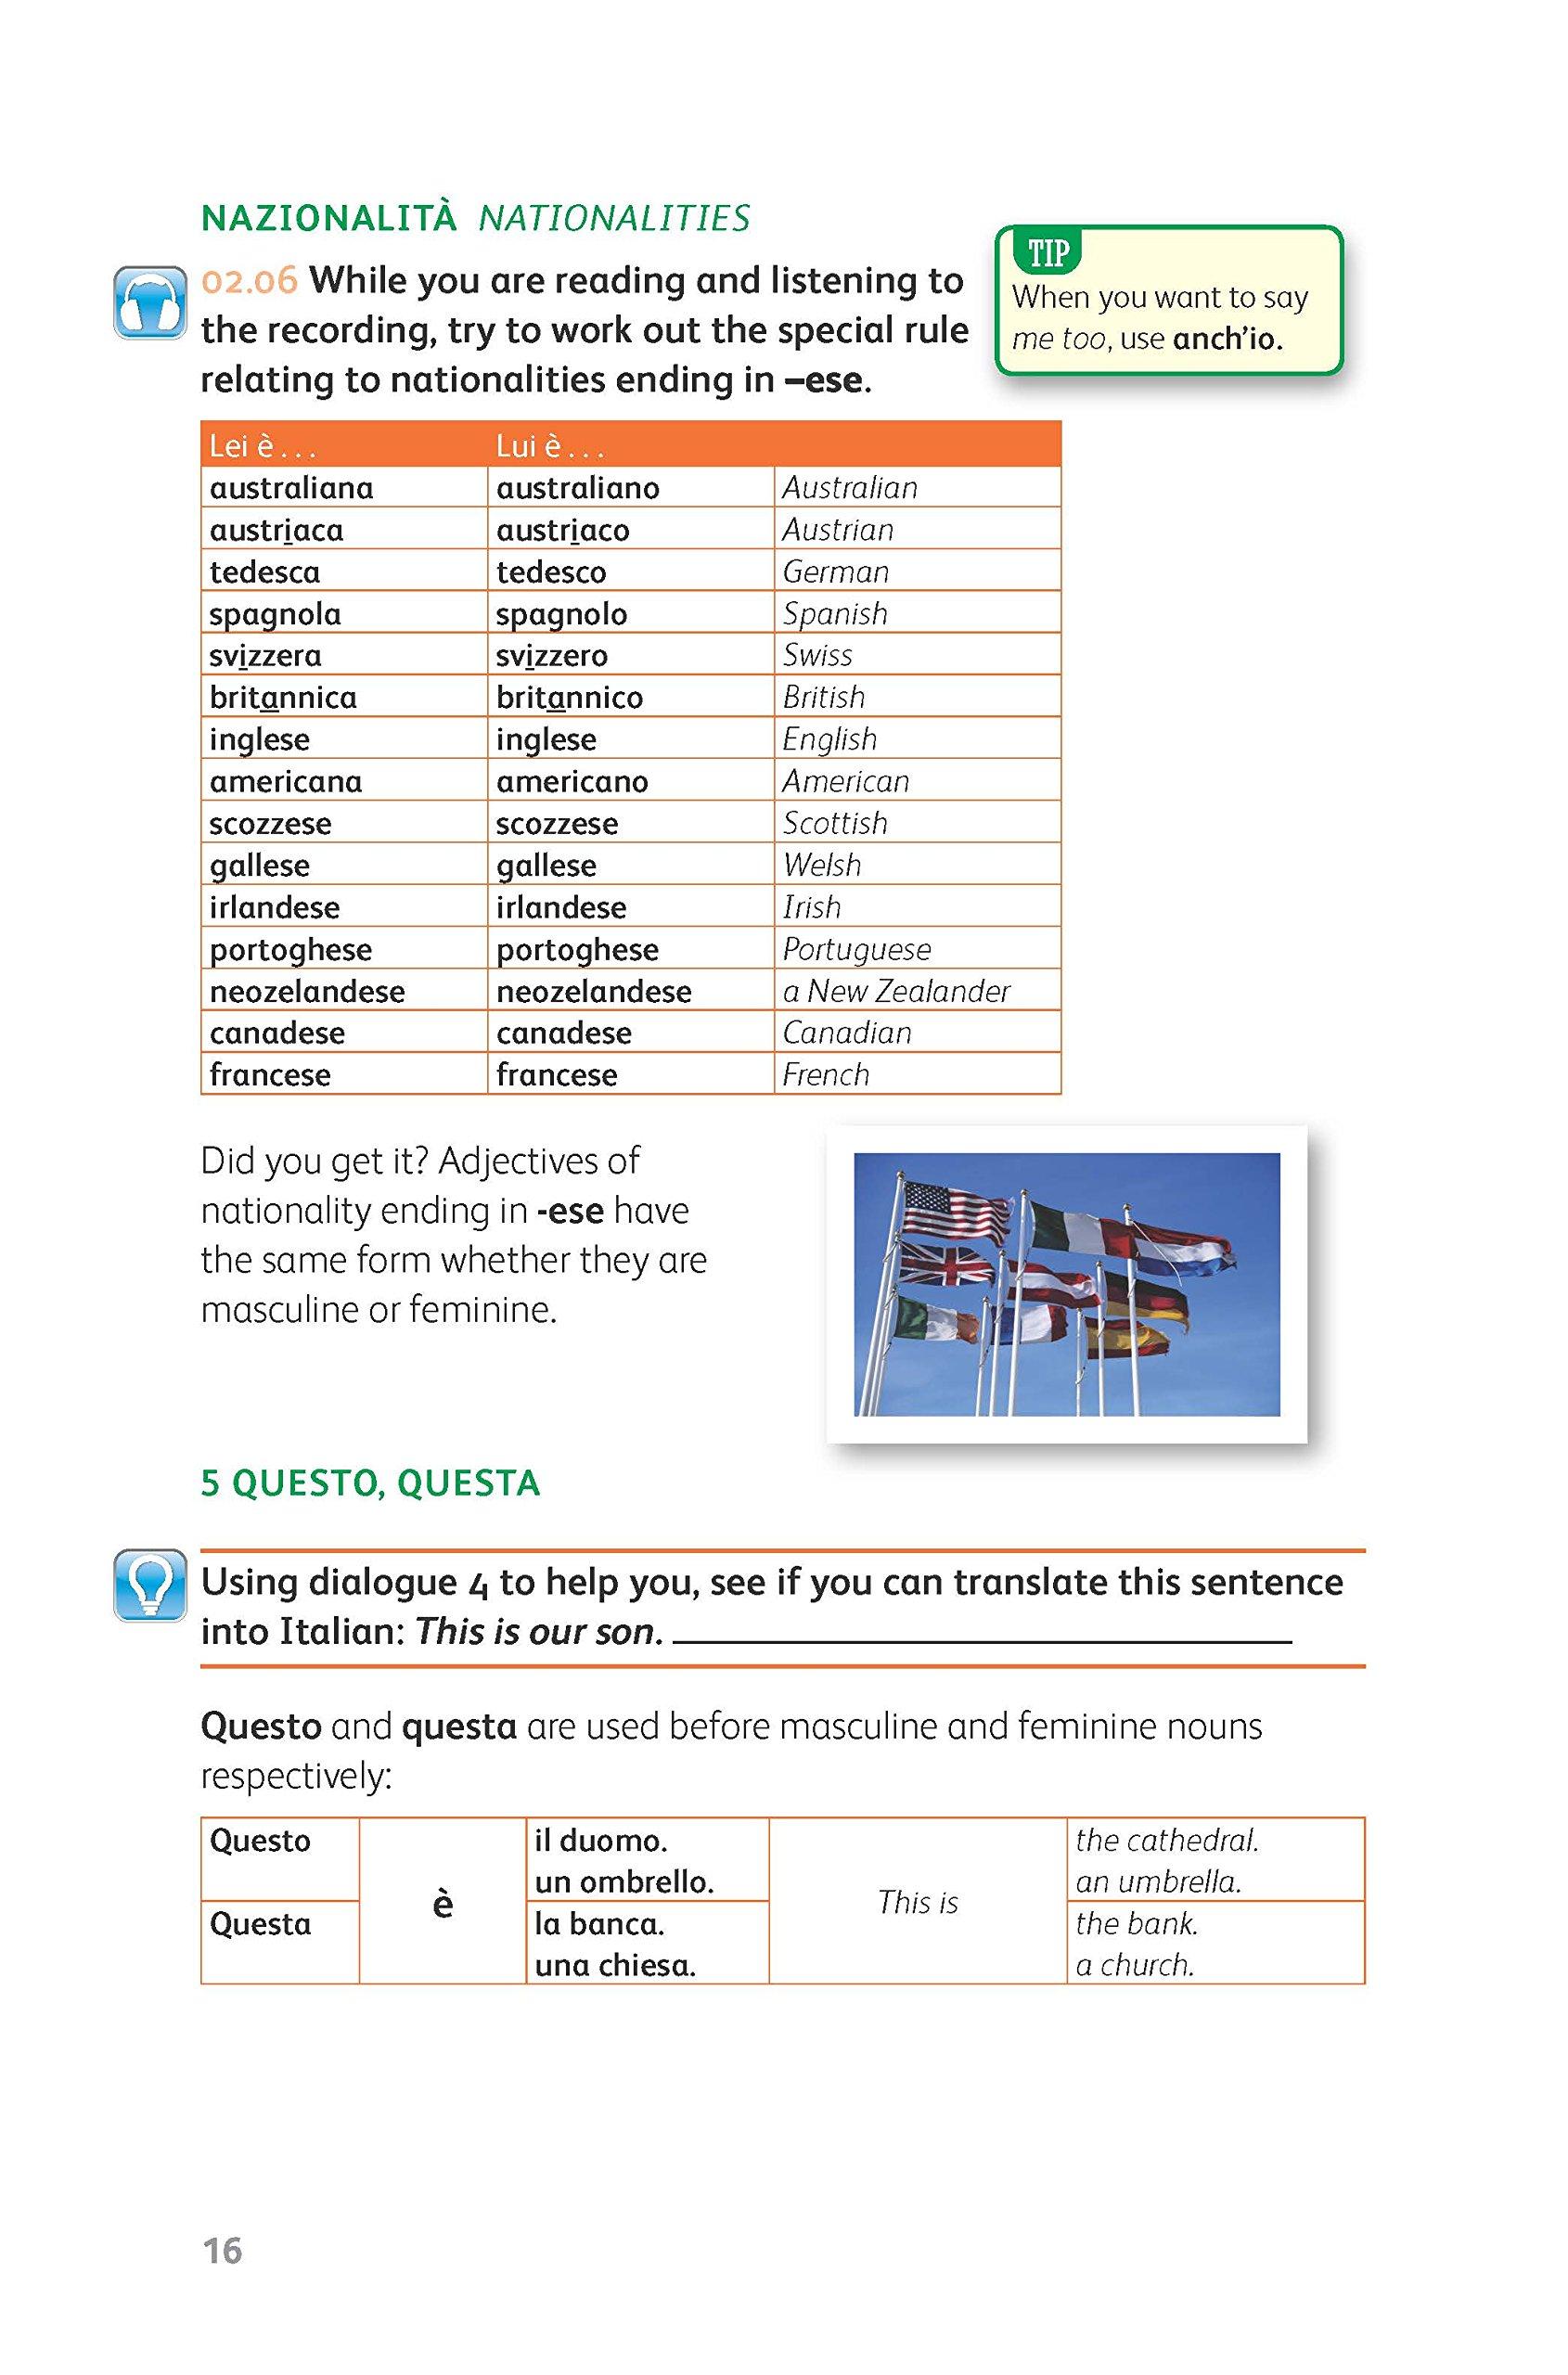 Get Started In Italian Vittoria Bowles 9781444174717 Amazon